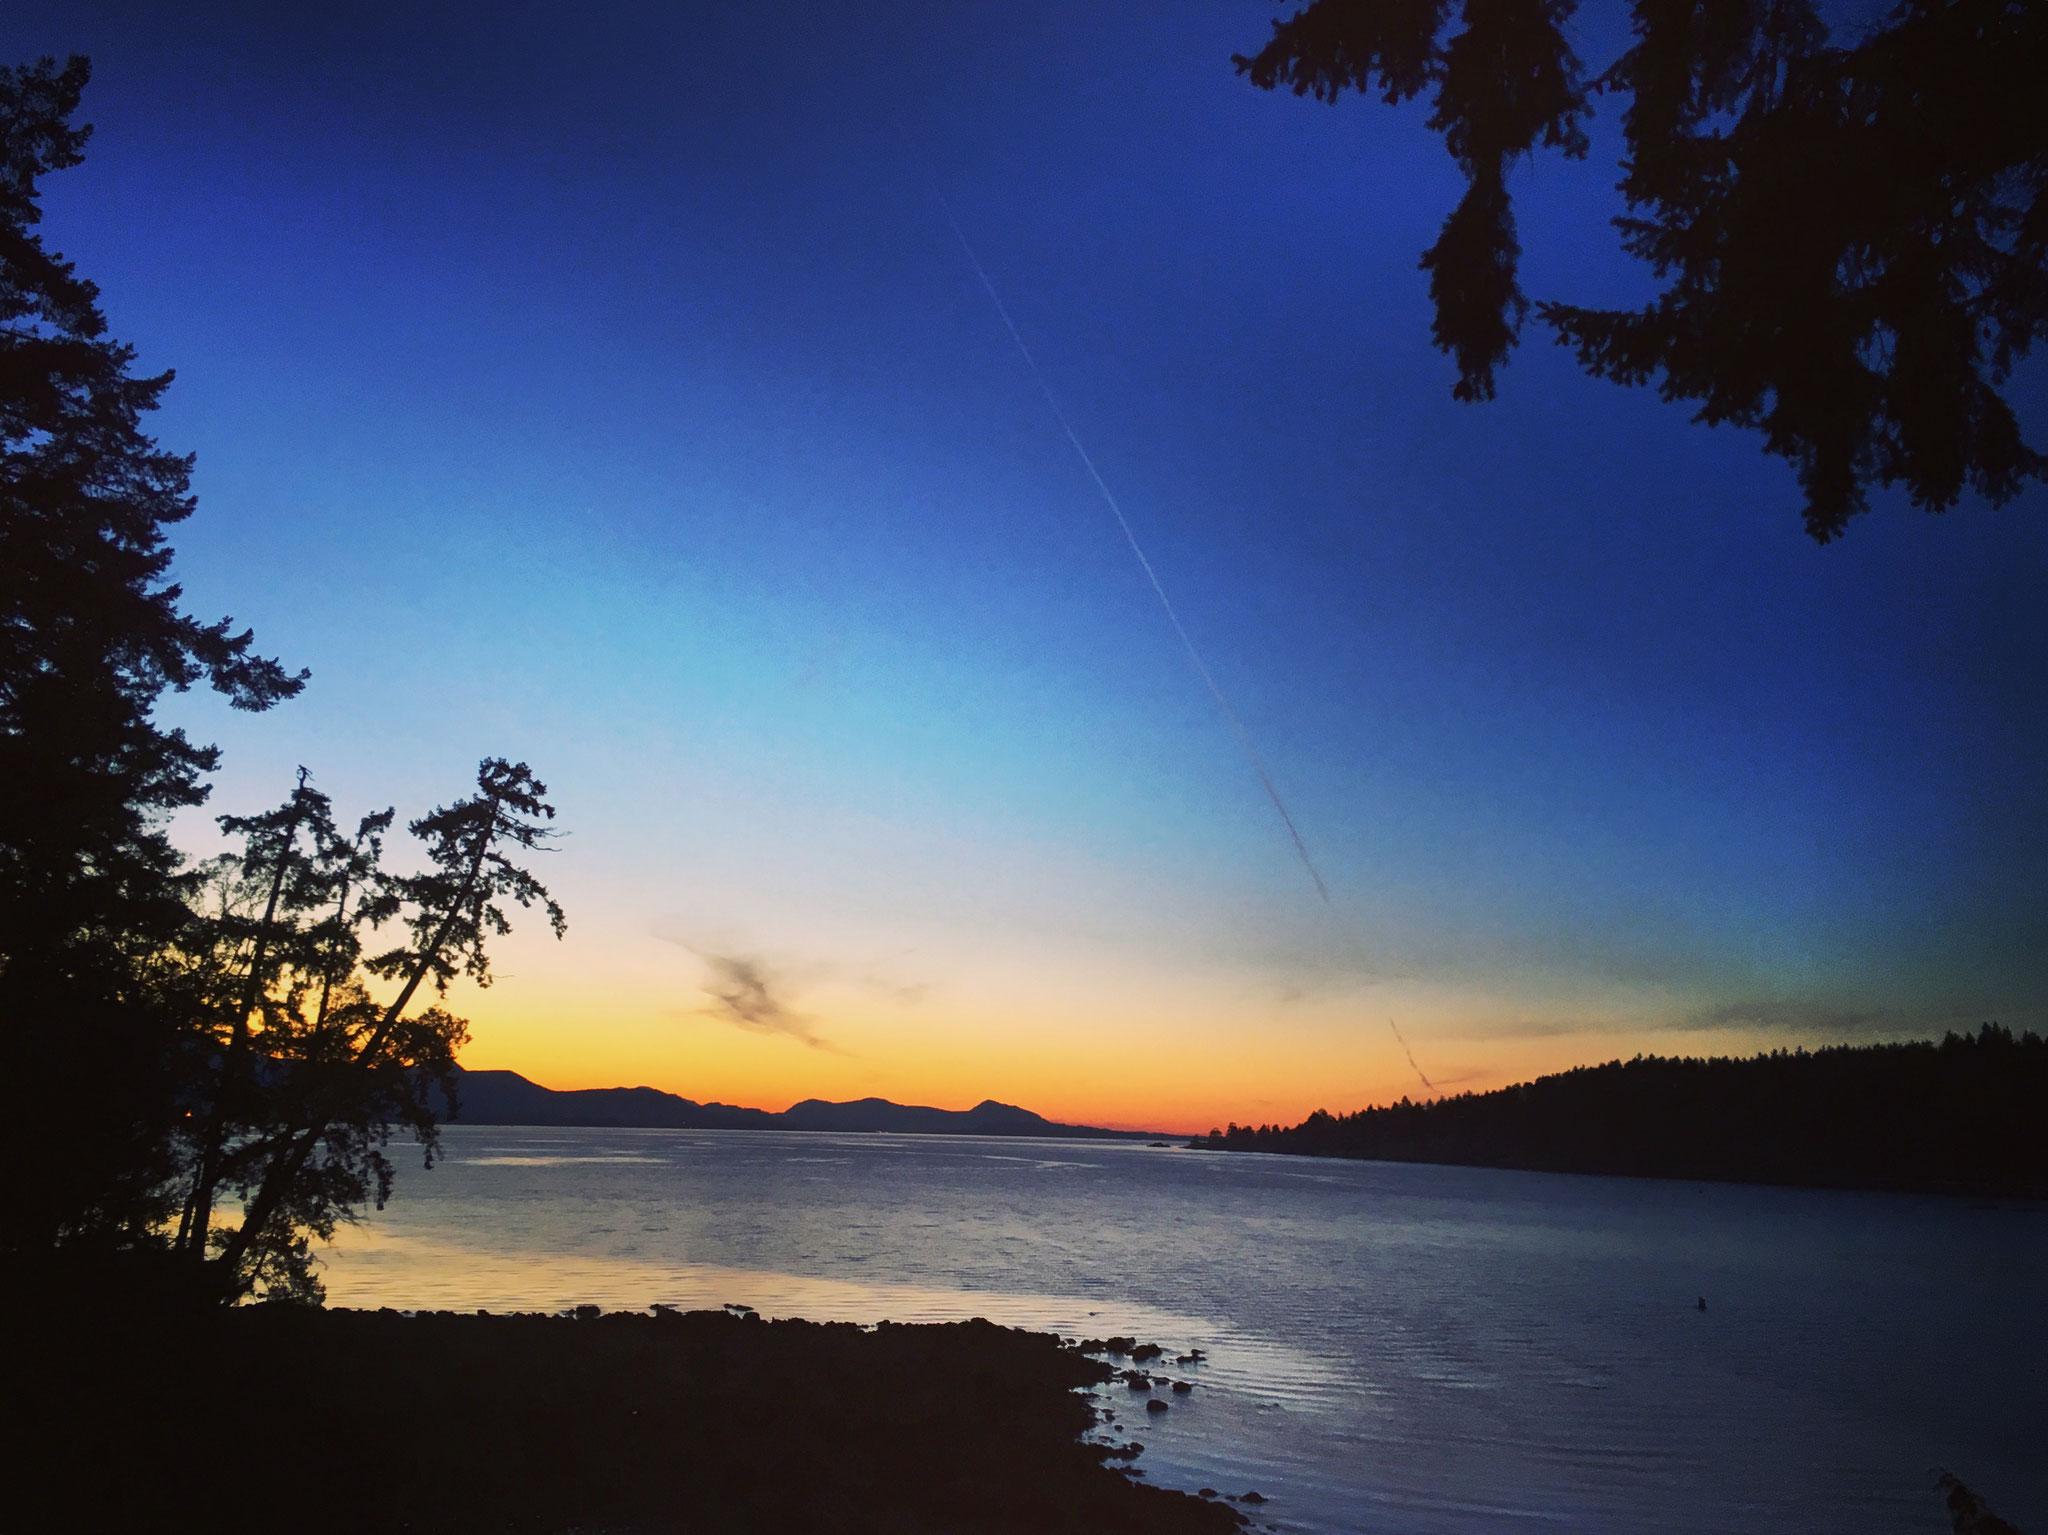 Bucht hinterm Haus, Saltspring Island, BC 2016